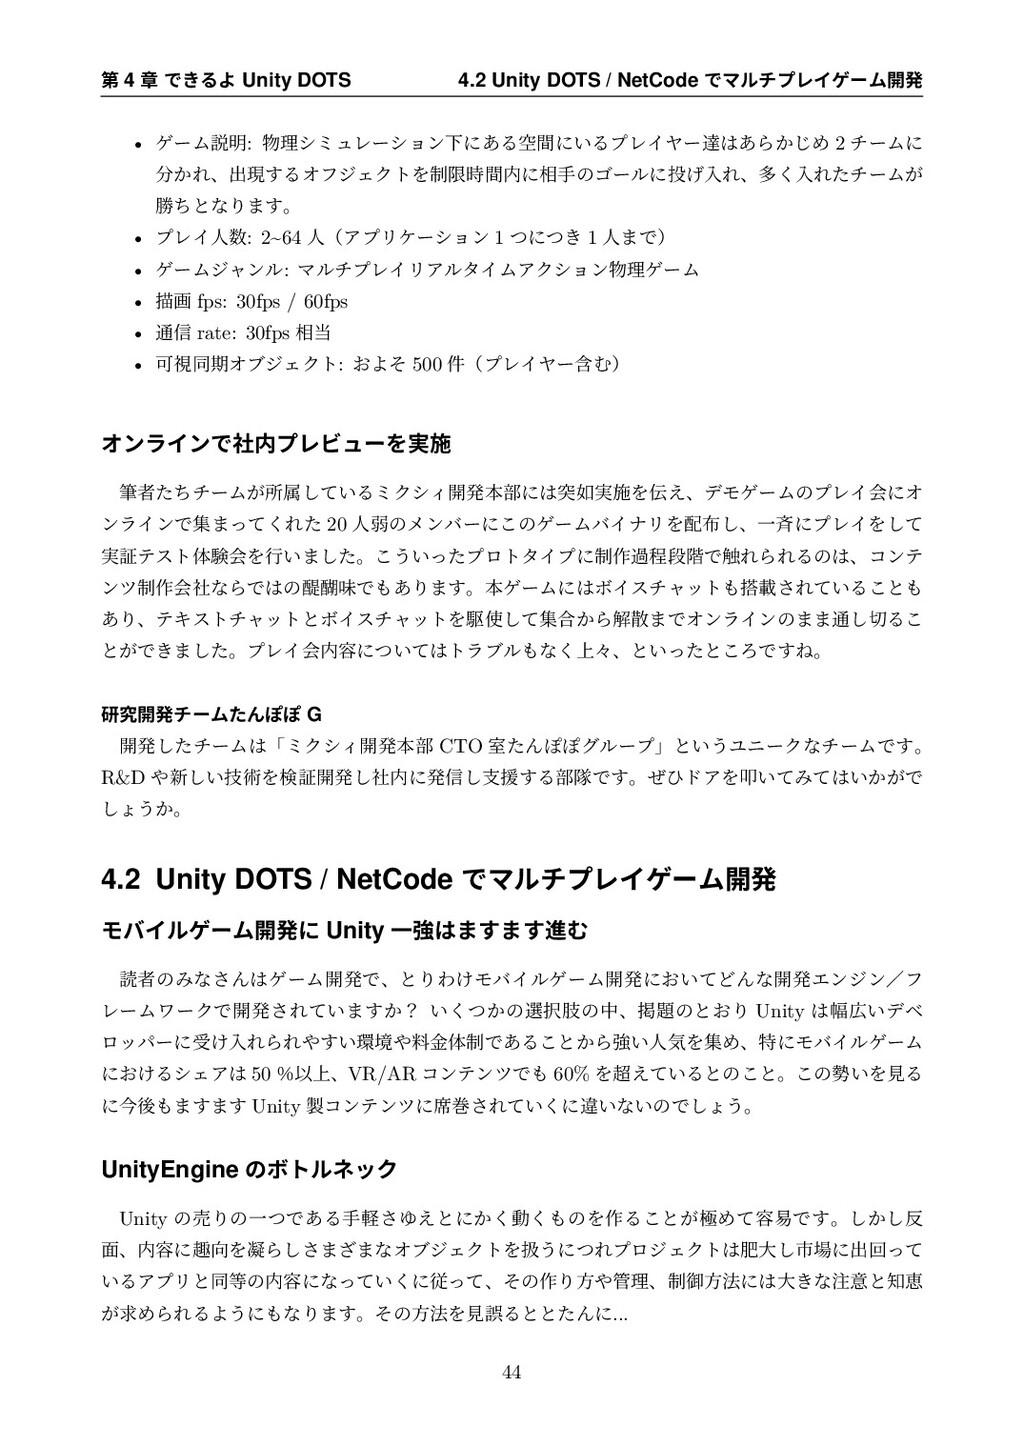 ୈ 4 ষ Ͱ͖ΔΑ Unity DOTS 4.2 Unity DOTS / NetCode ...